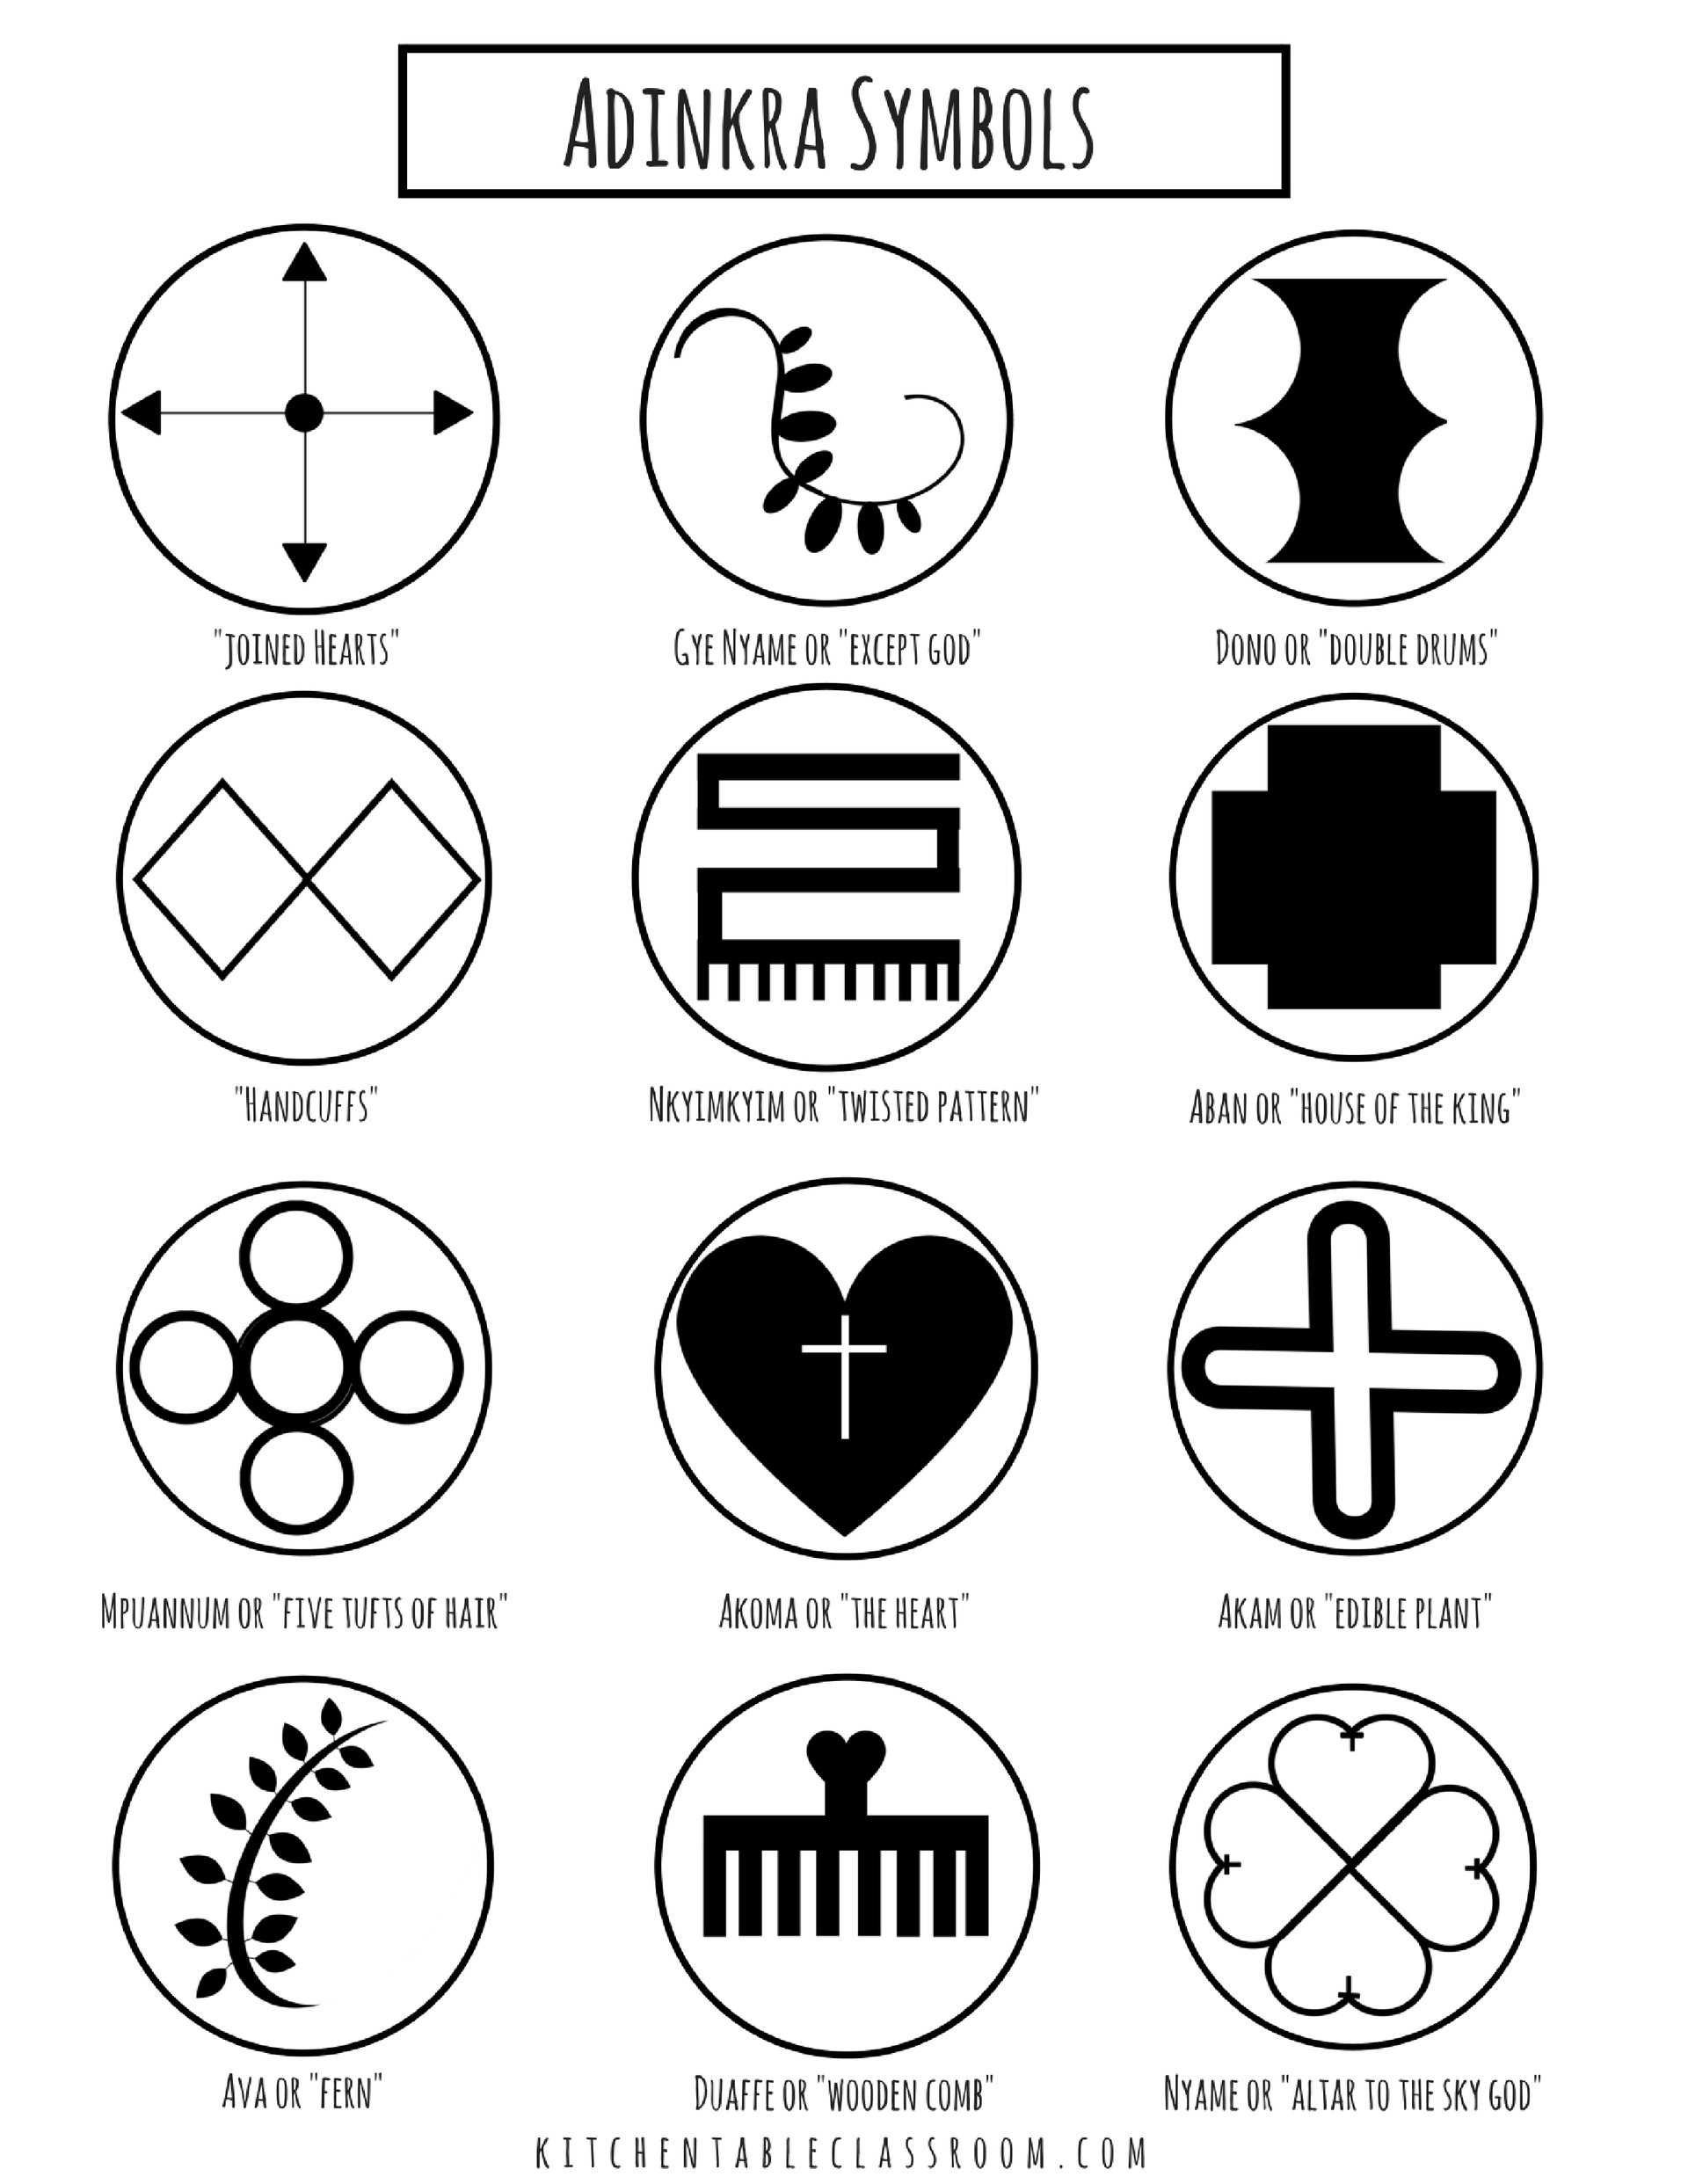 Adinkra Symbols Exploring Printmaking And Patterning Through